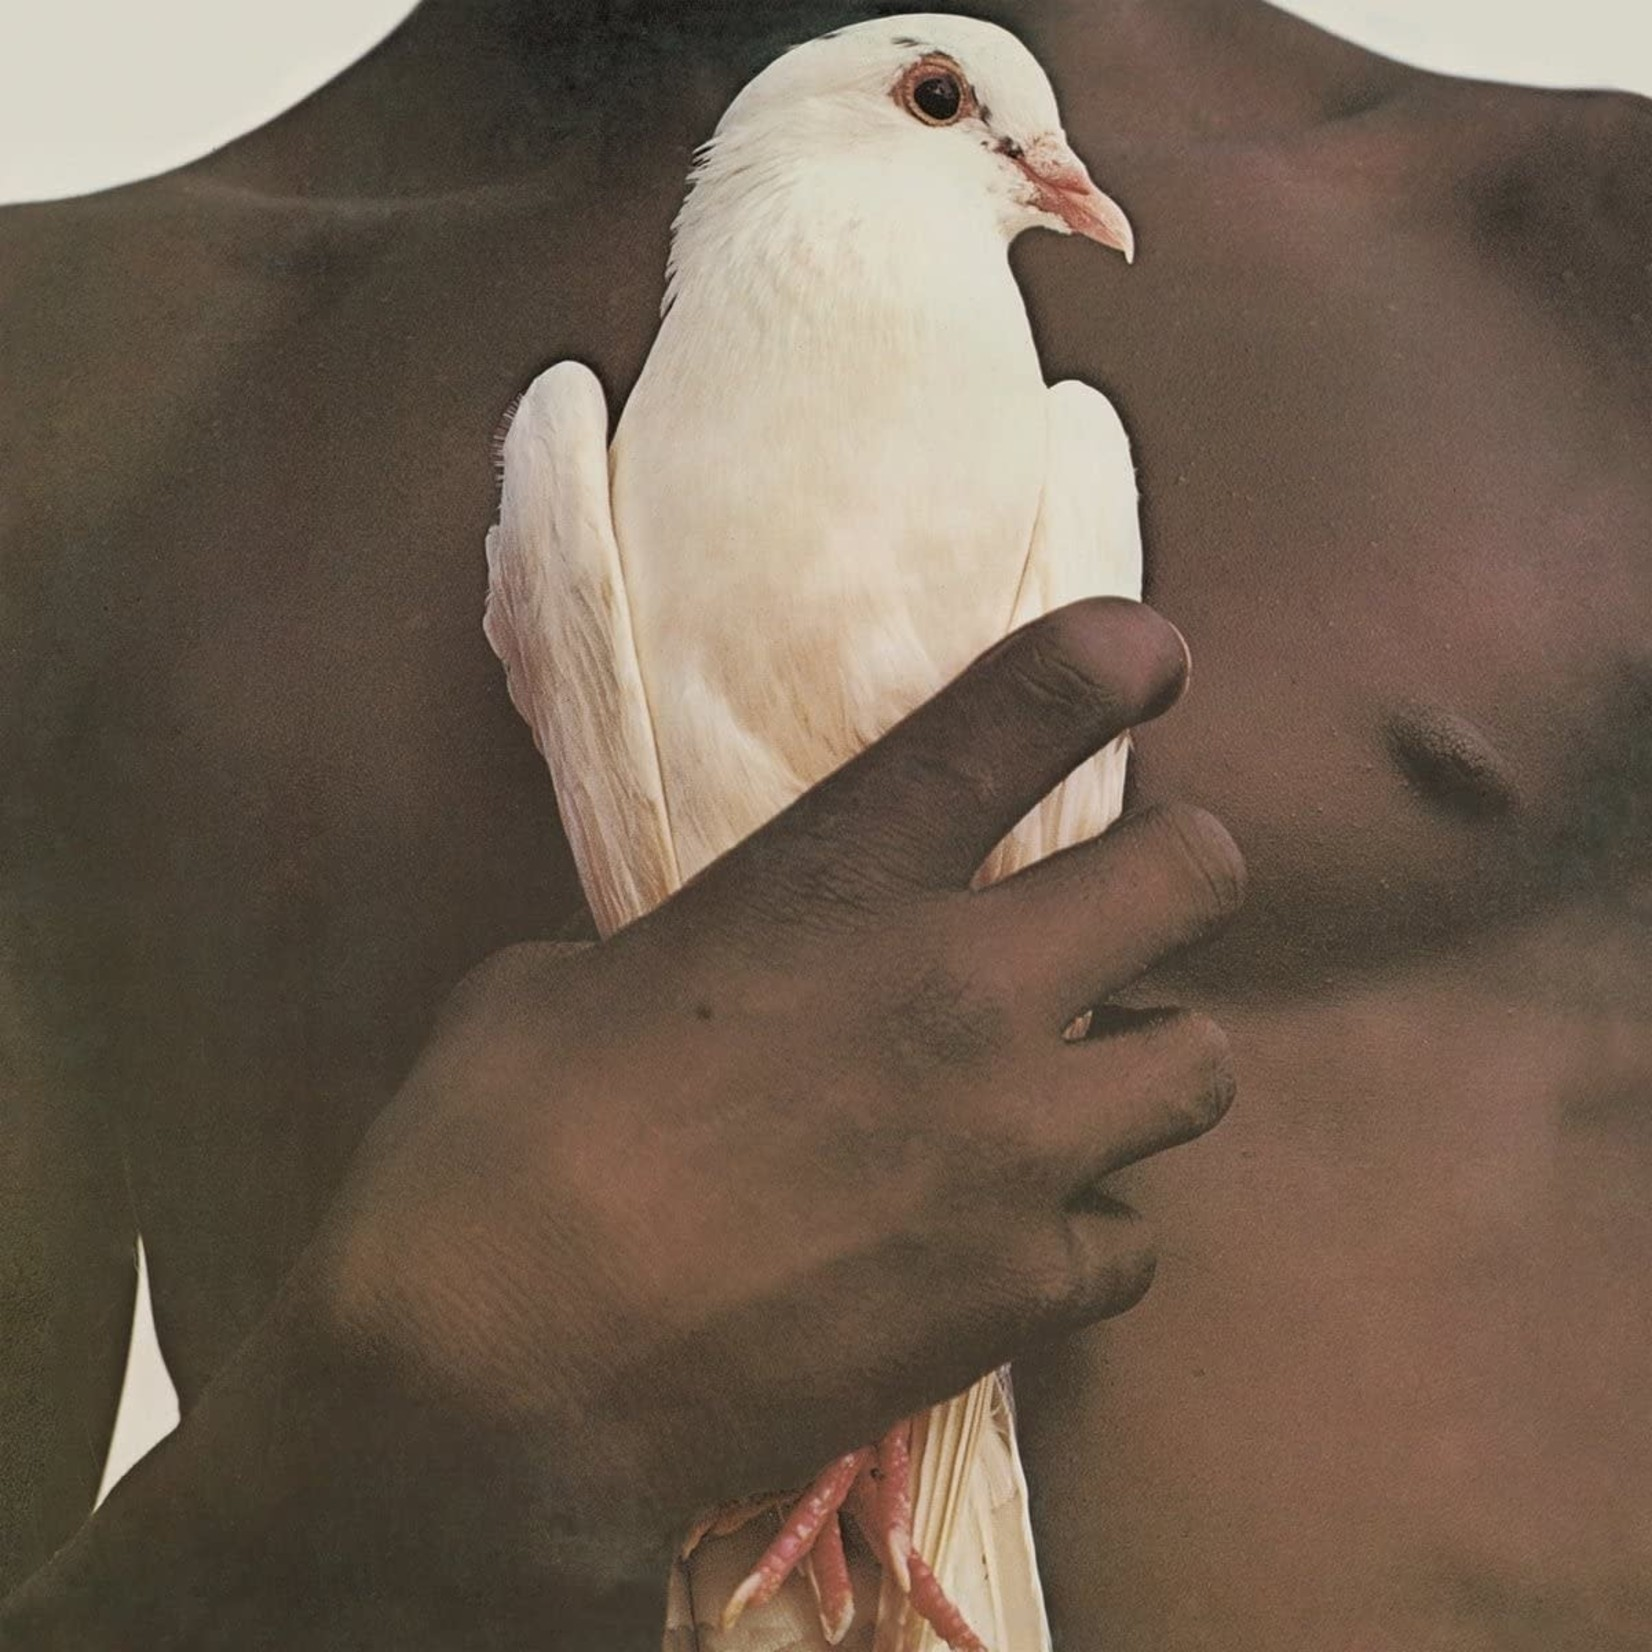 SANTANA GREATEST HITS (1974) LP